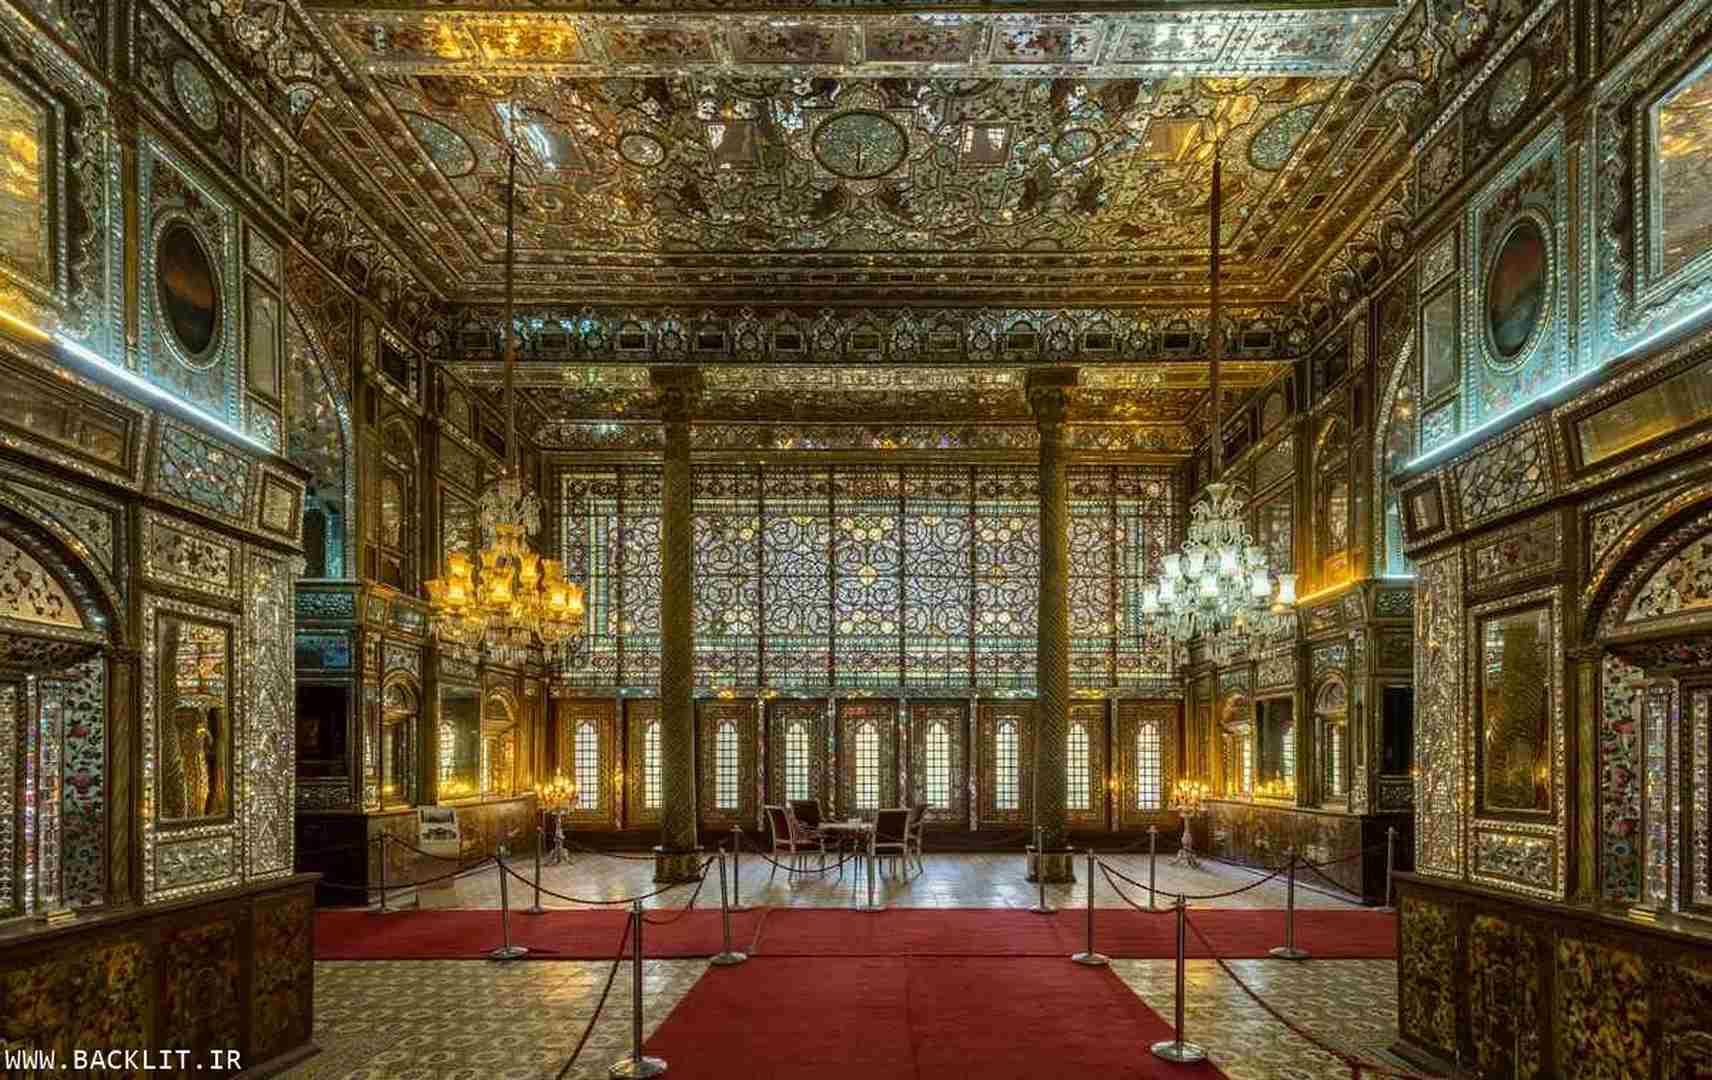 خرید قاب عکس کاخ گلستان